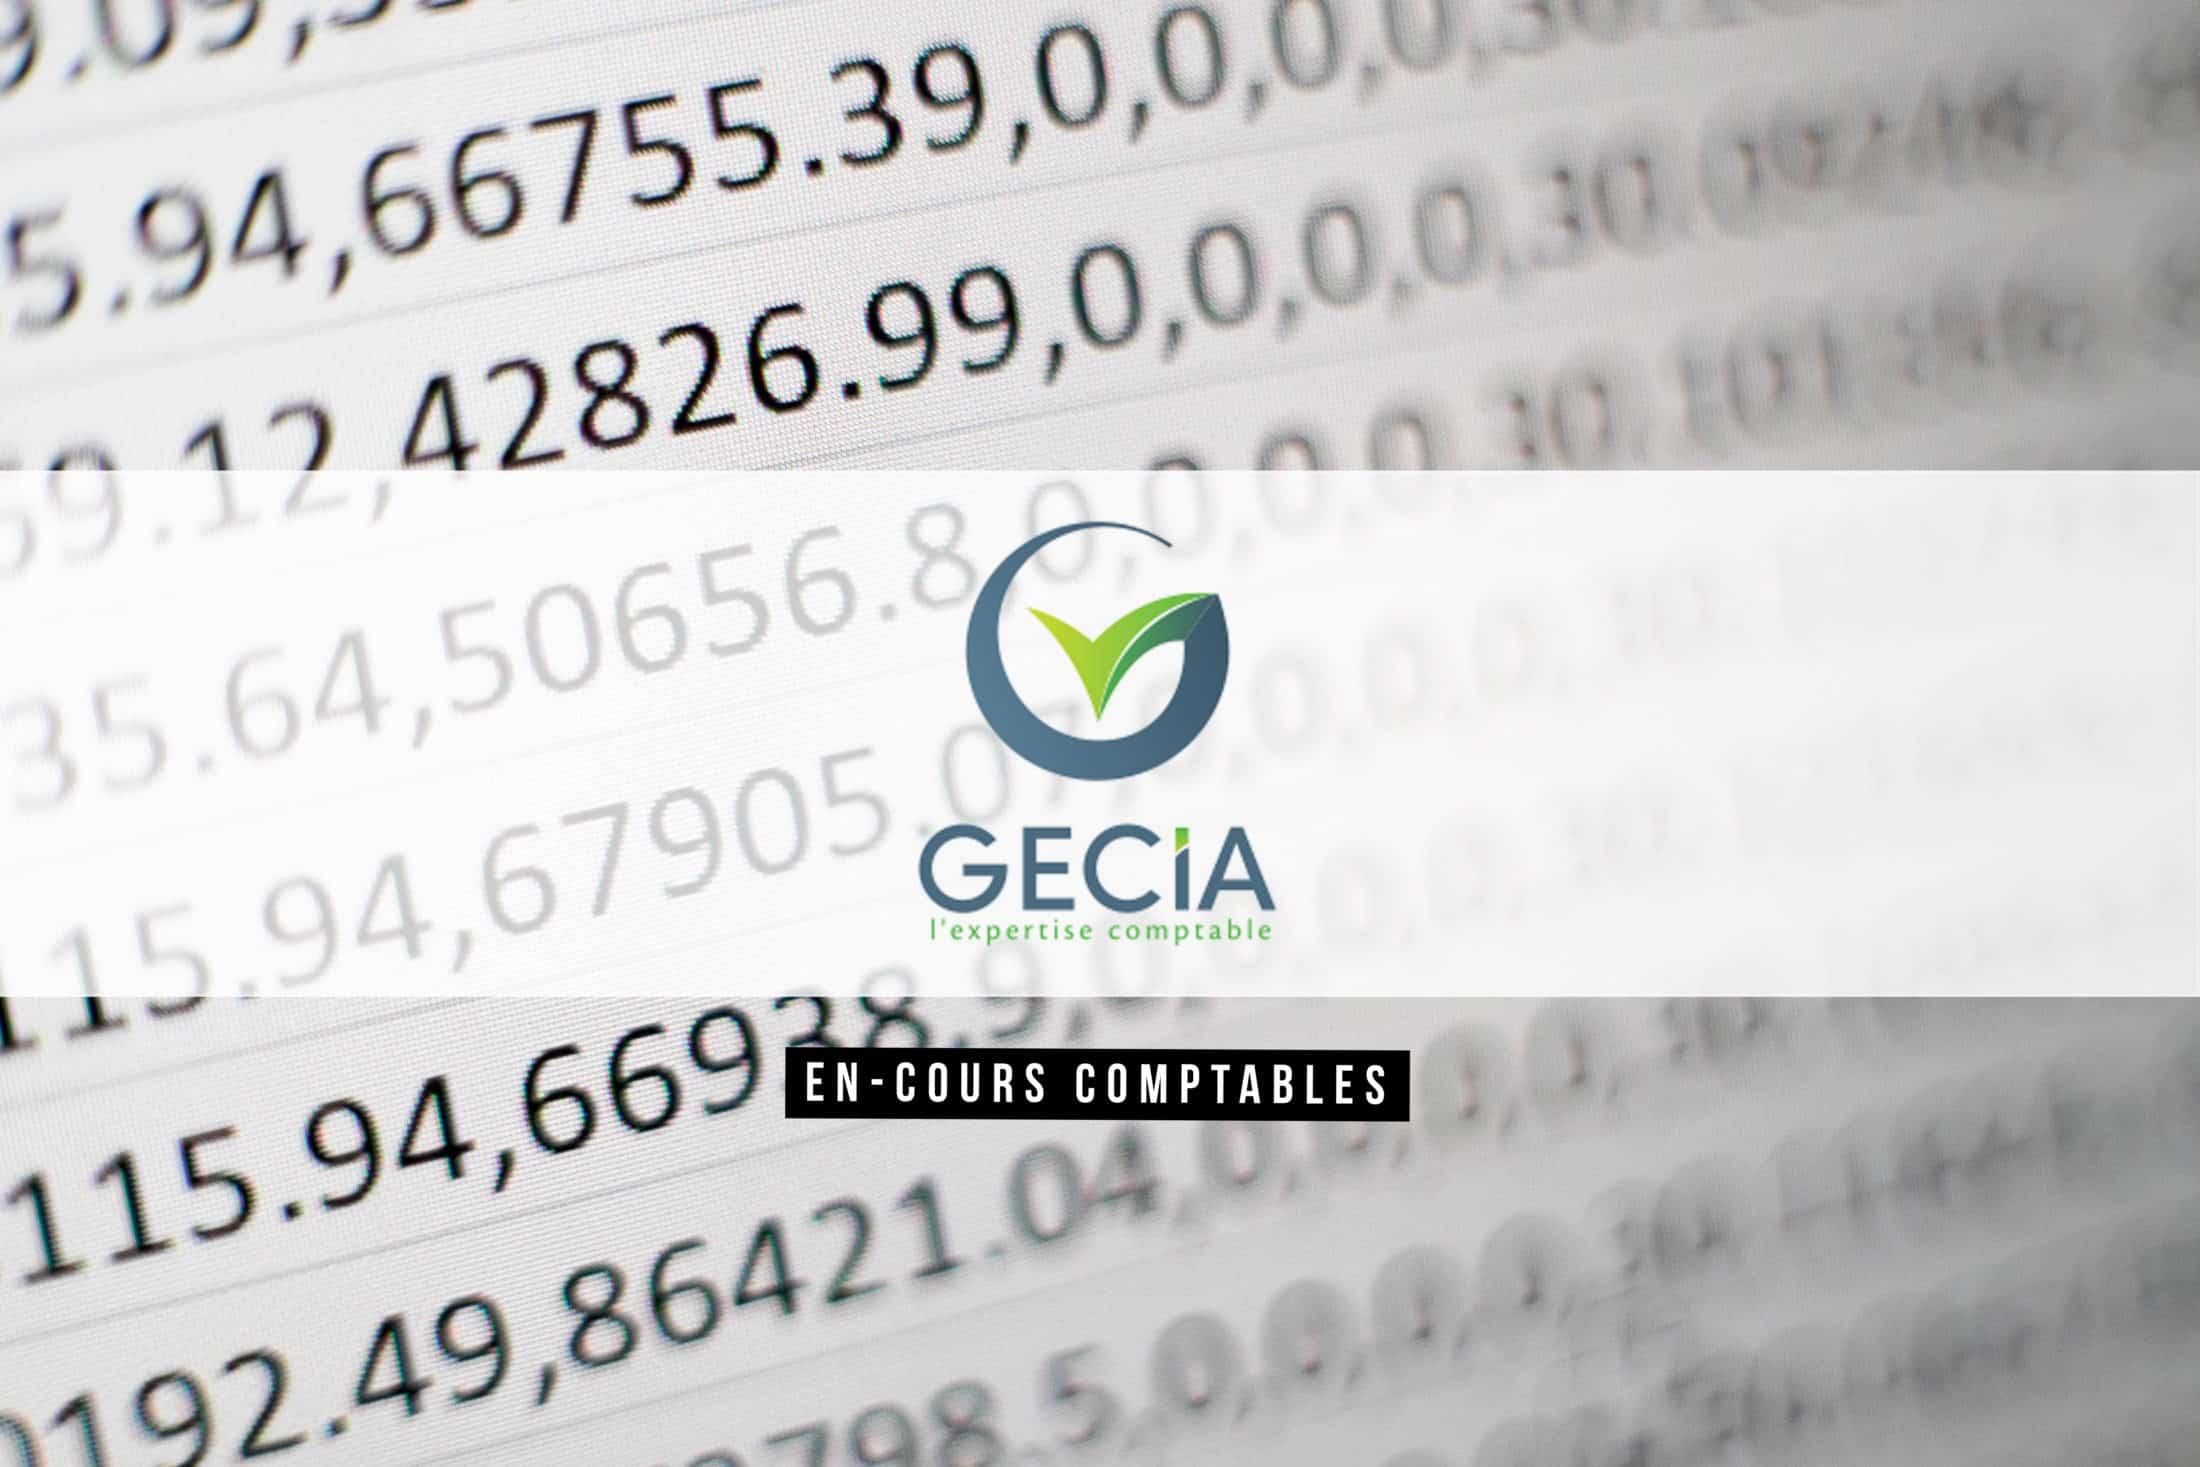 en-cours-comptables-gecia-expertise-comptable